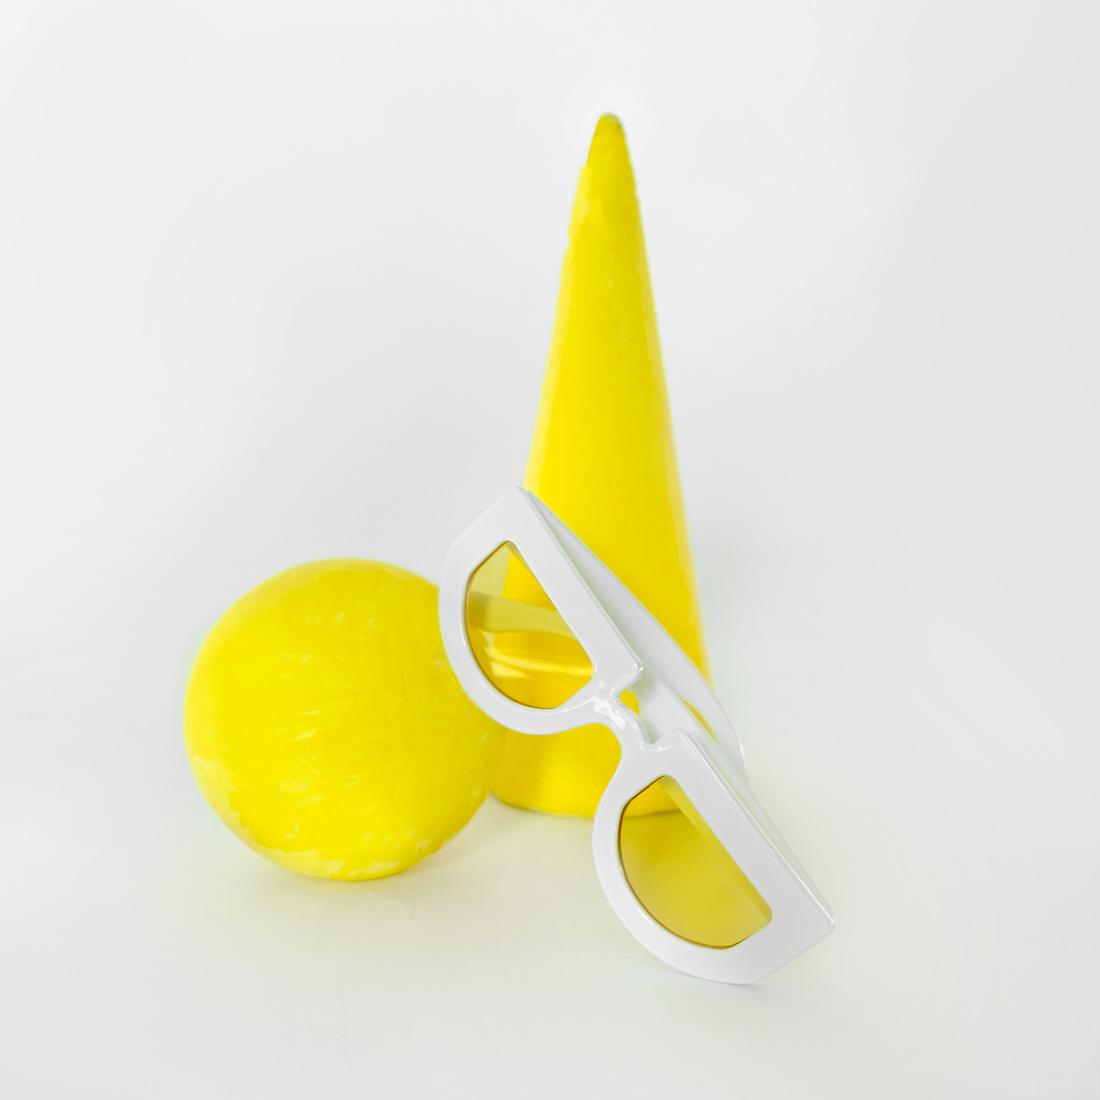 LCDglasses_yellow3